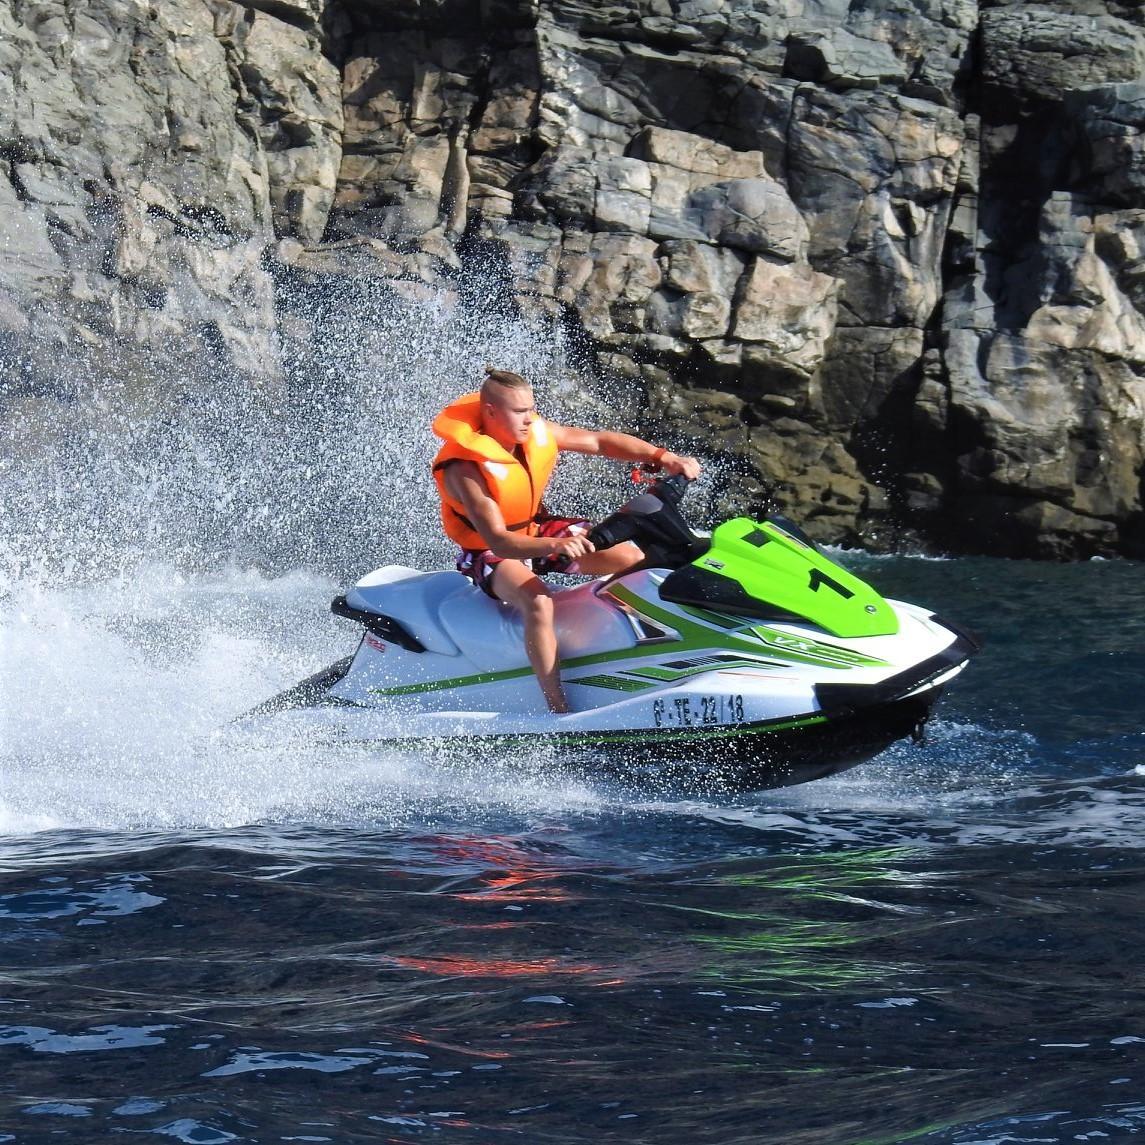 Jet Ski Safari from Costa Adeje